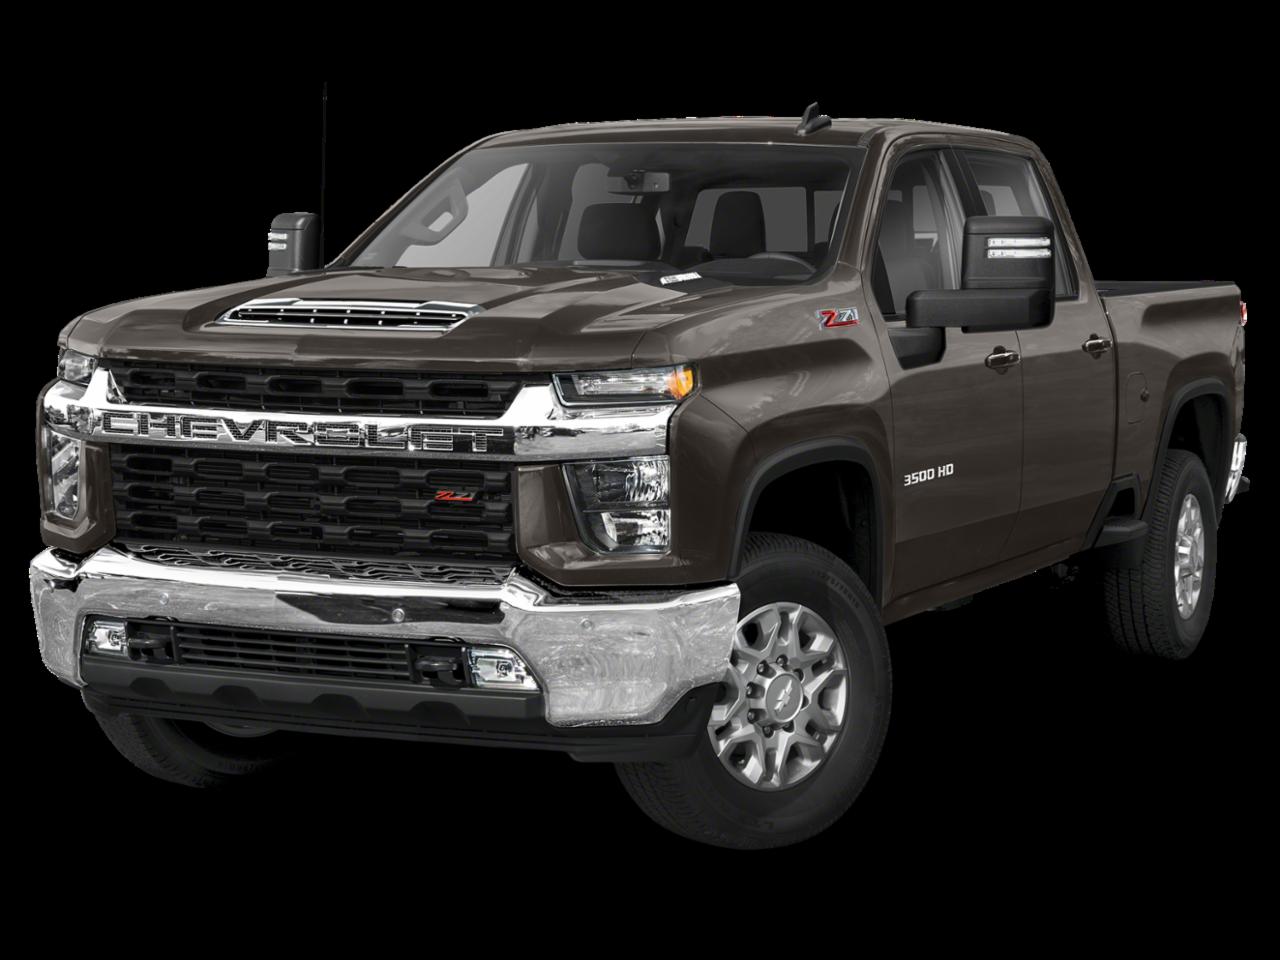 Lynch Chevrolet Of Kenosha Your Preferred Pleasant Prairie Racine New And Used Vehicle Dealership Alternative